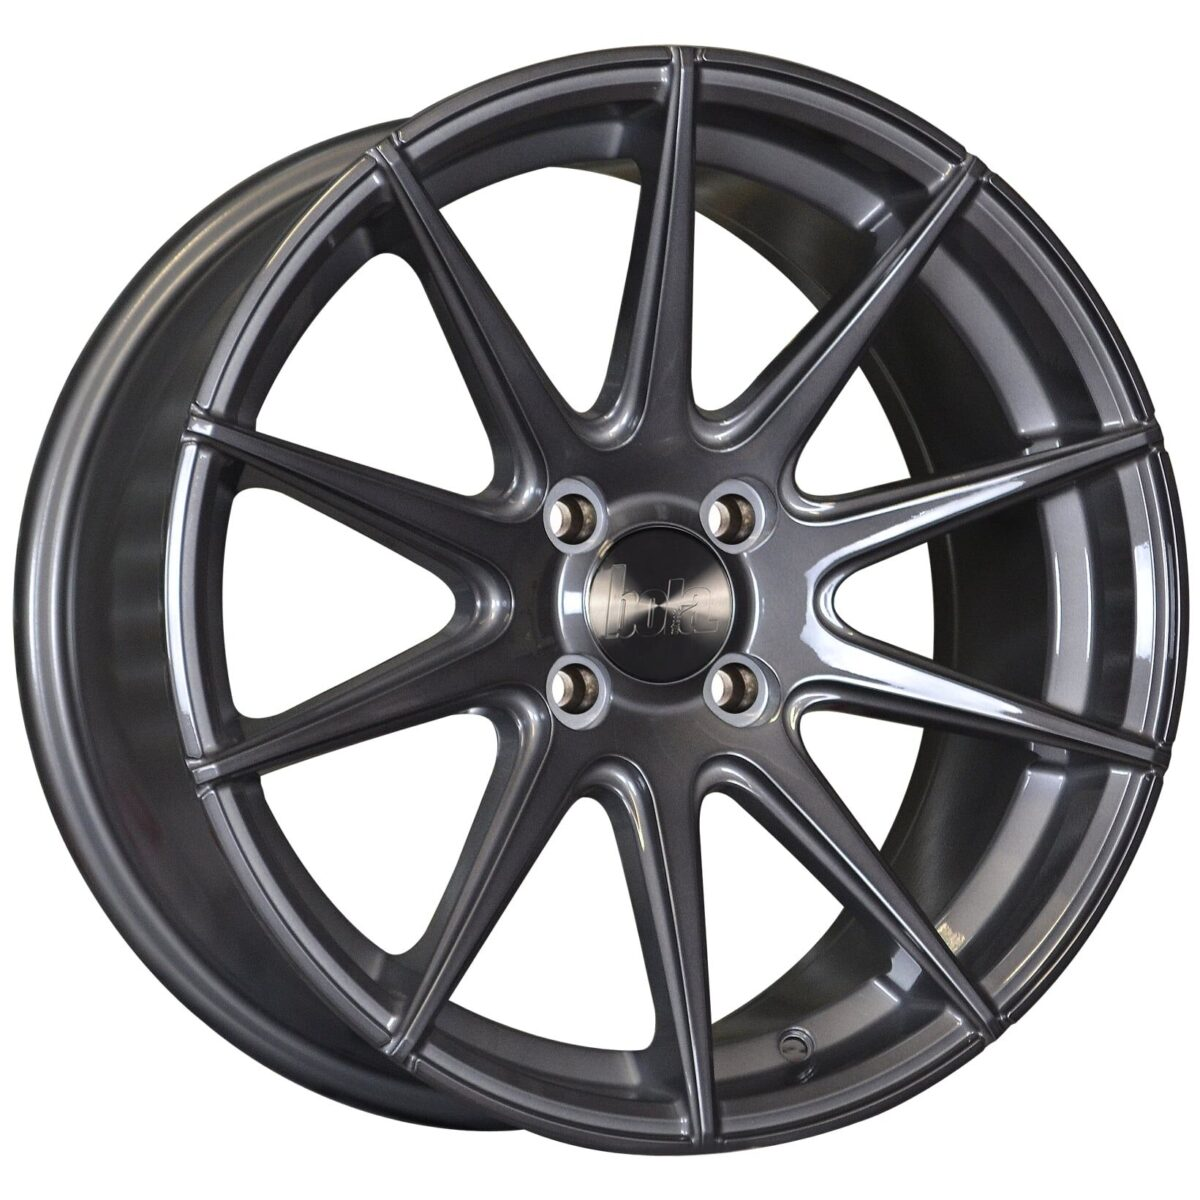 "19"" BOLA CSR Wheels - Gloss Titanium - All BMW Models"